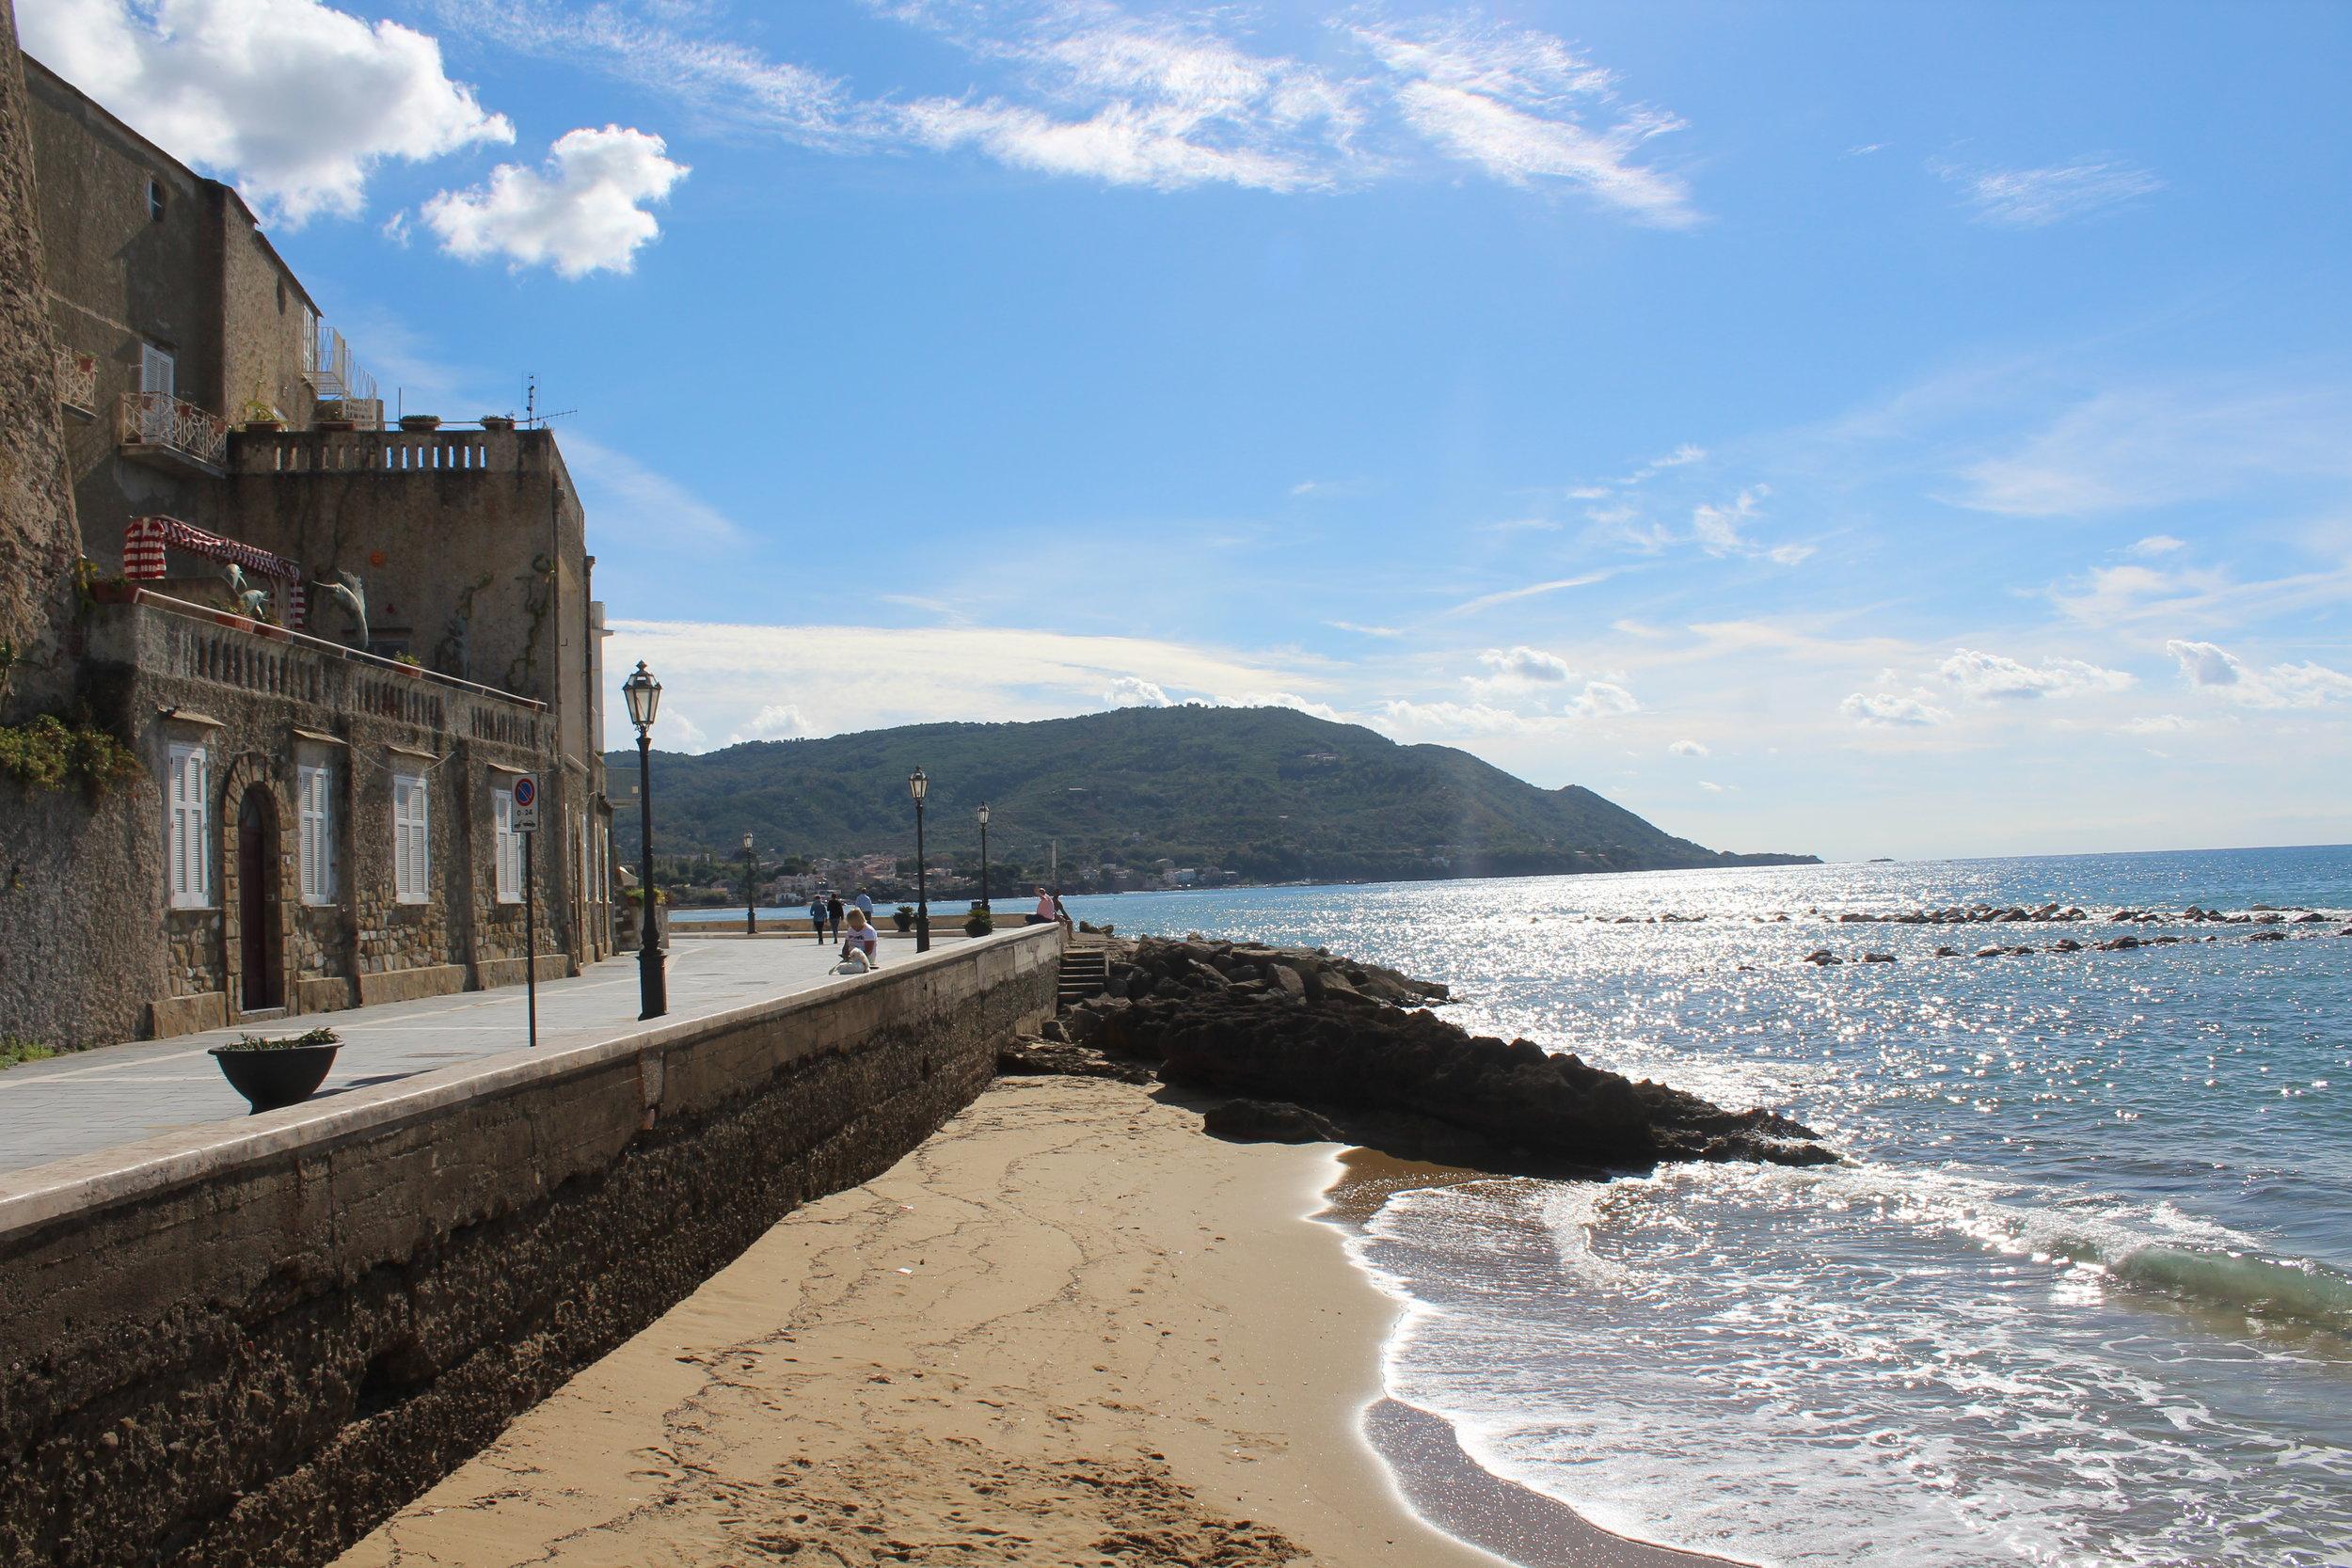 The seaside promenade in Santa Maria di Castellabate in front of Palazzo Belmonte.